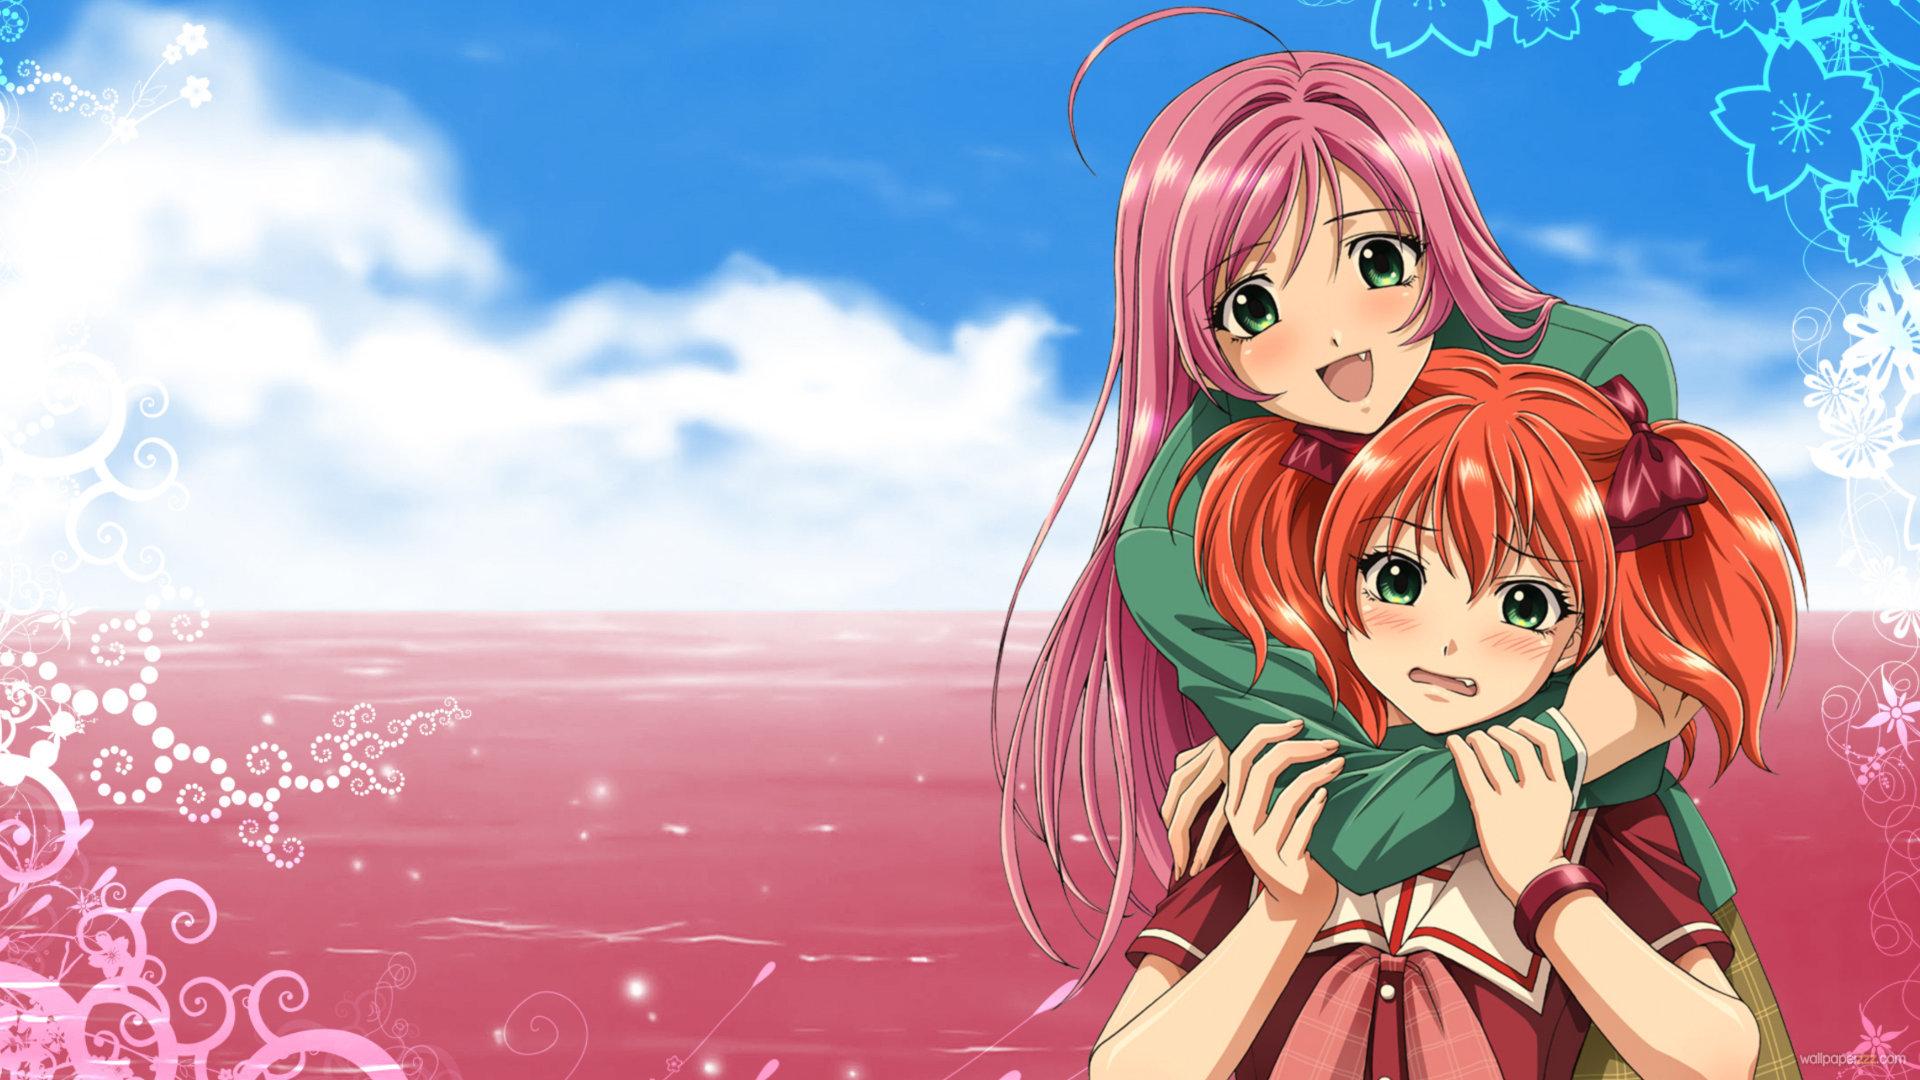 1920x1080 Anime girl pink hair Wallpaper